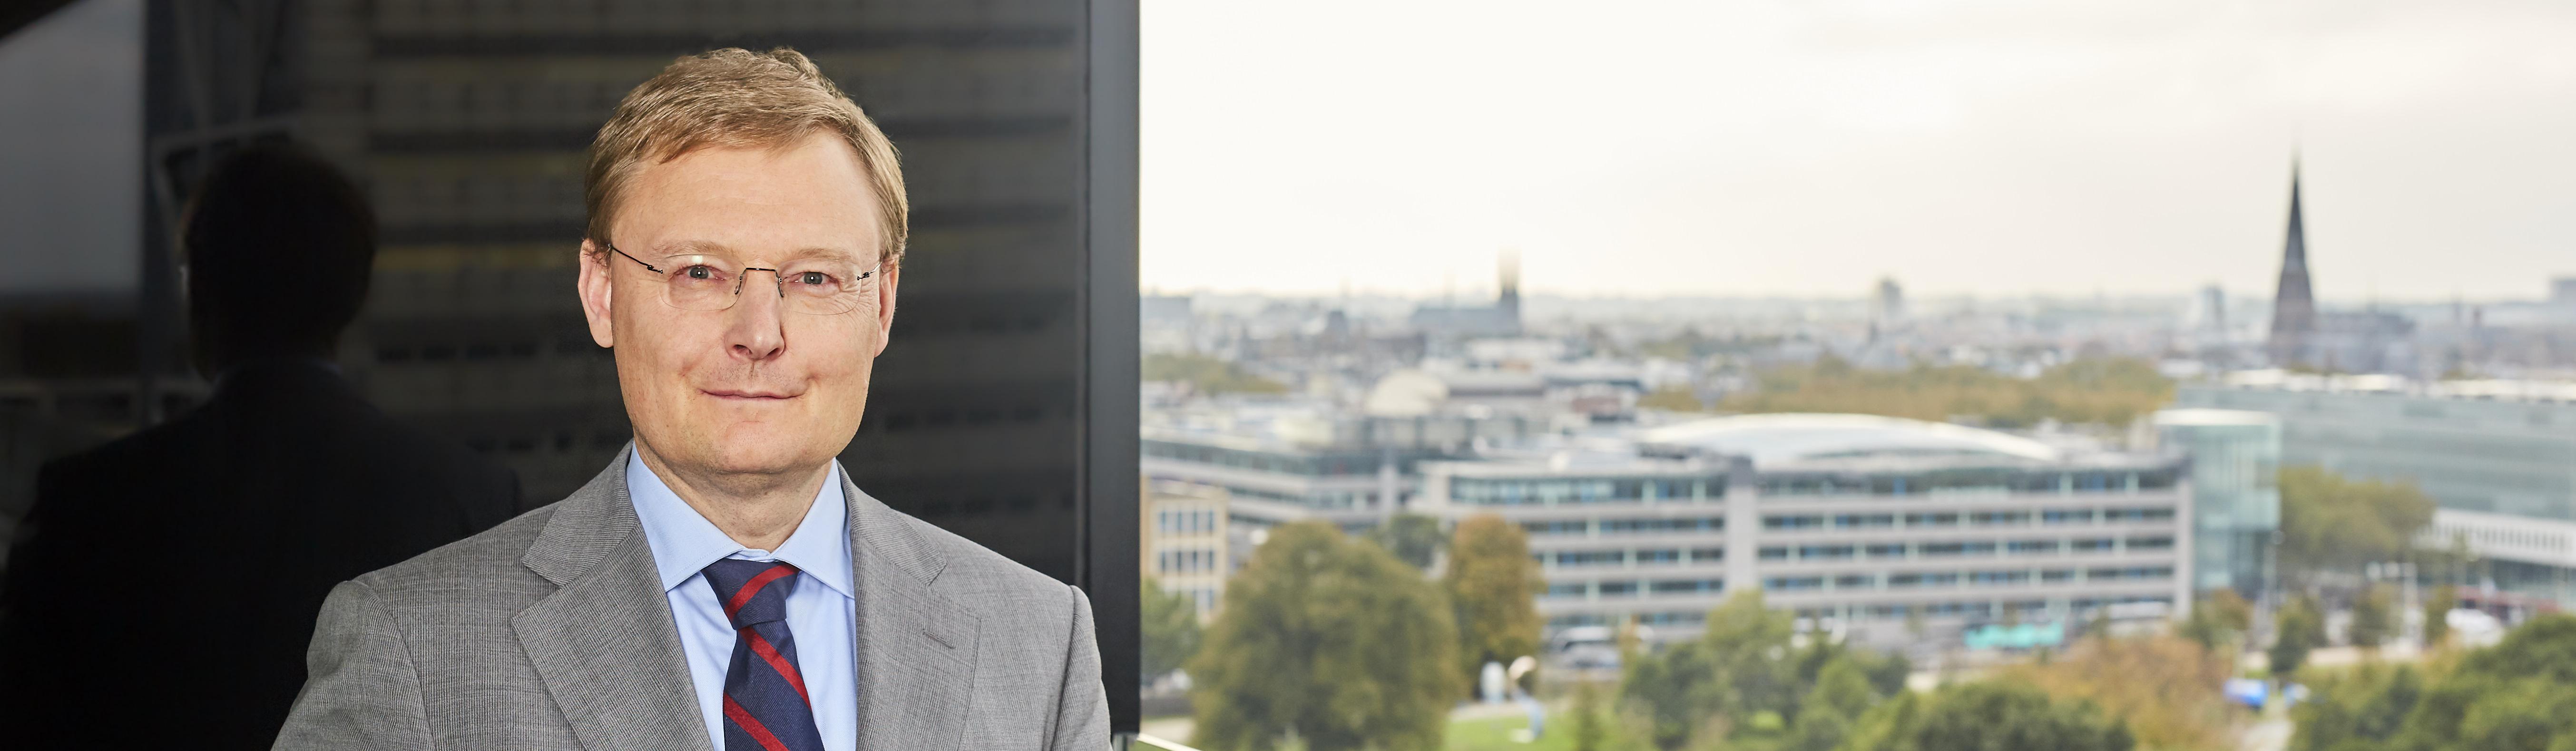 Gerrit-Jan Zwenne, advocaat Pels Rijcken